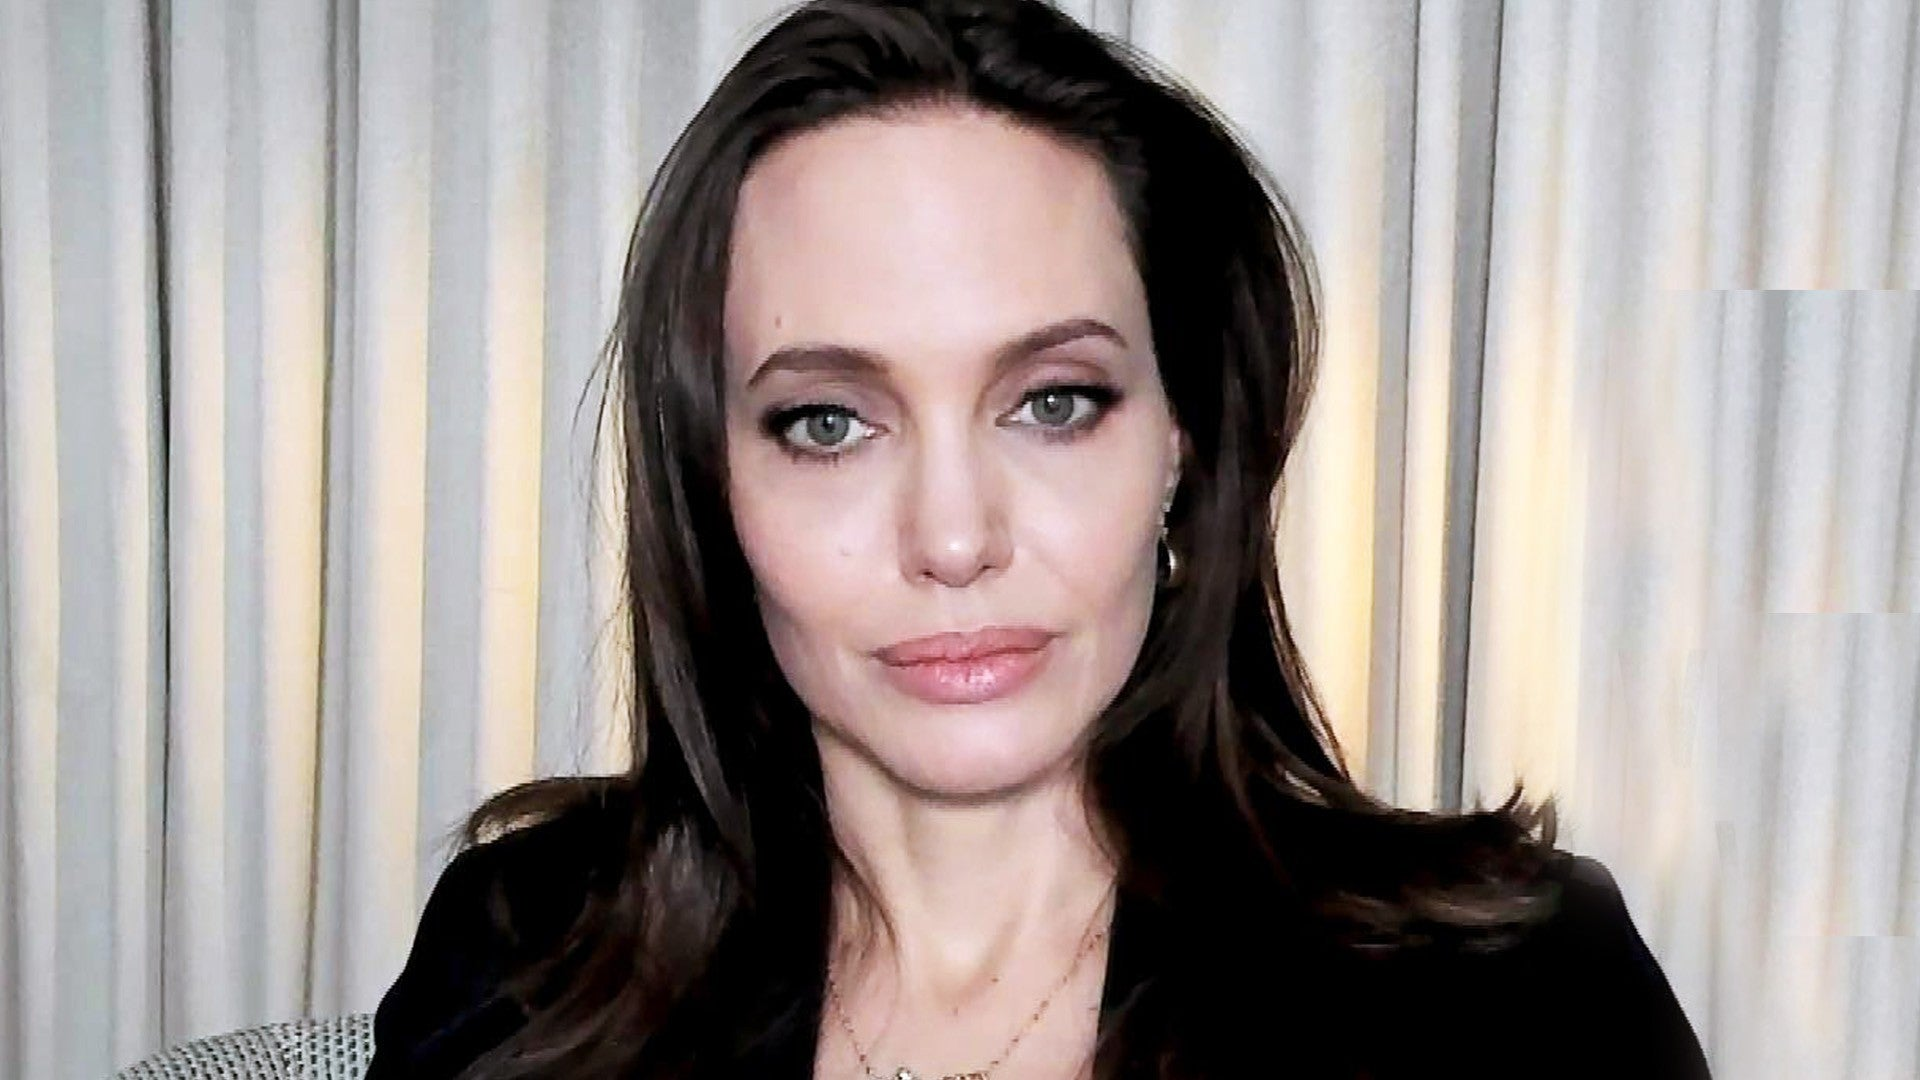 Angelina Jolie Says Her 6 Kids Always Make Her Cry